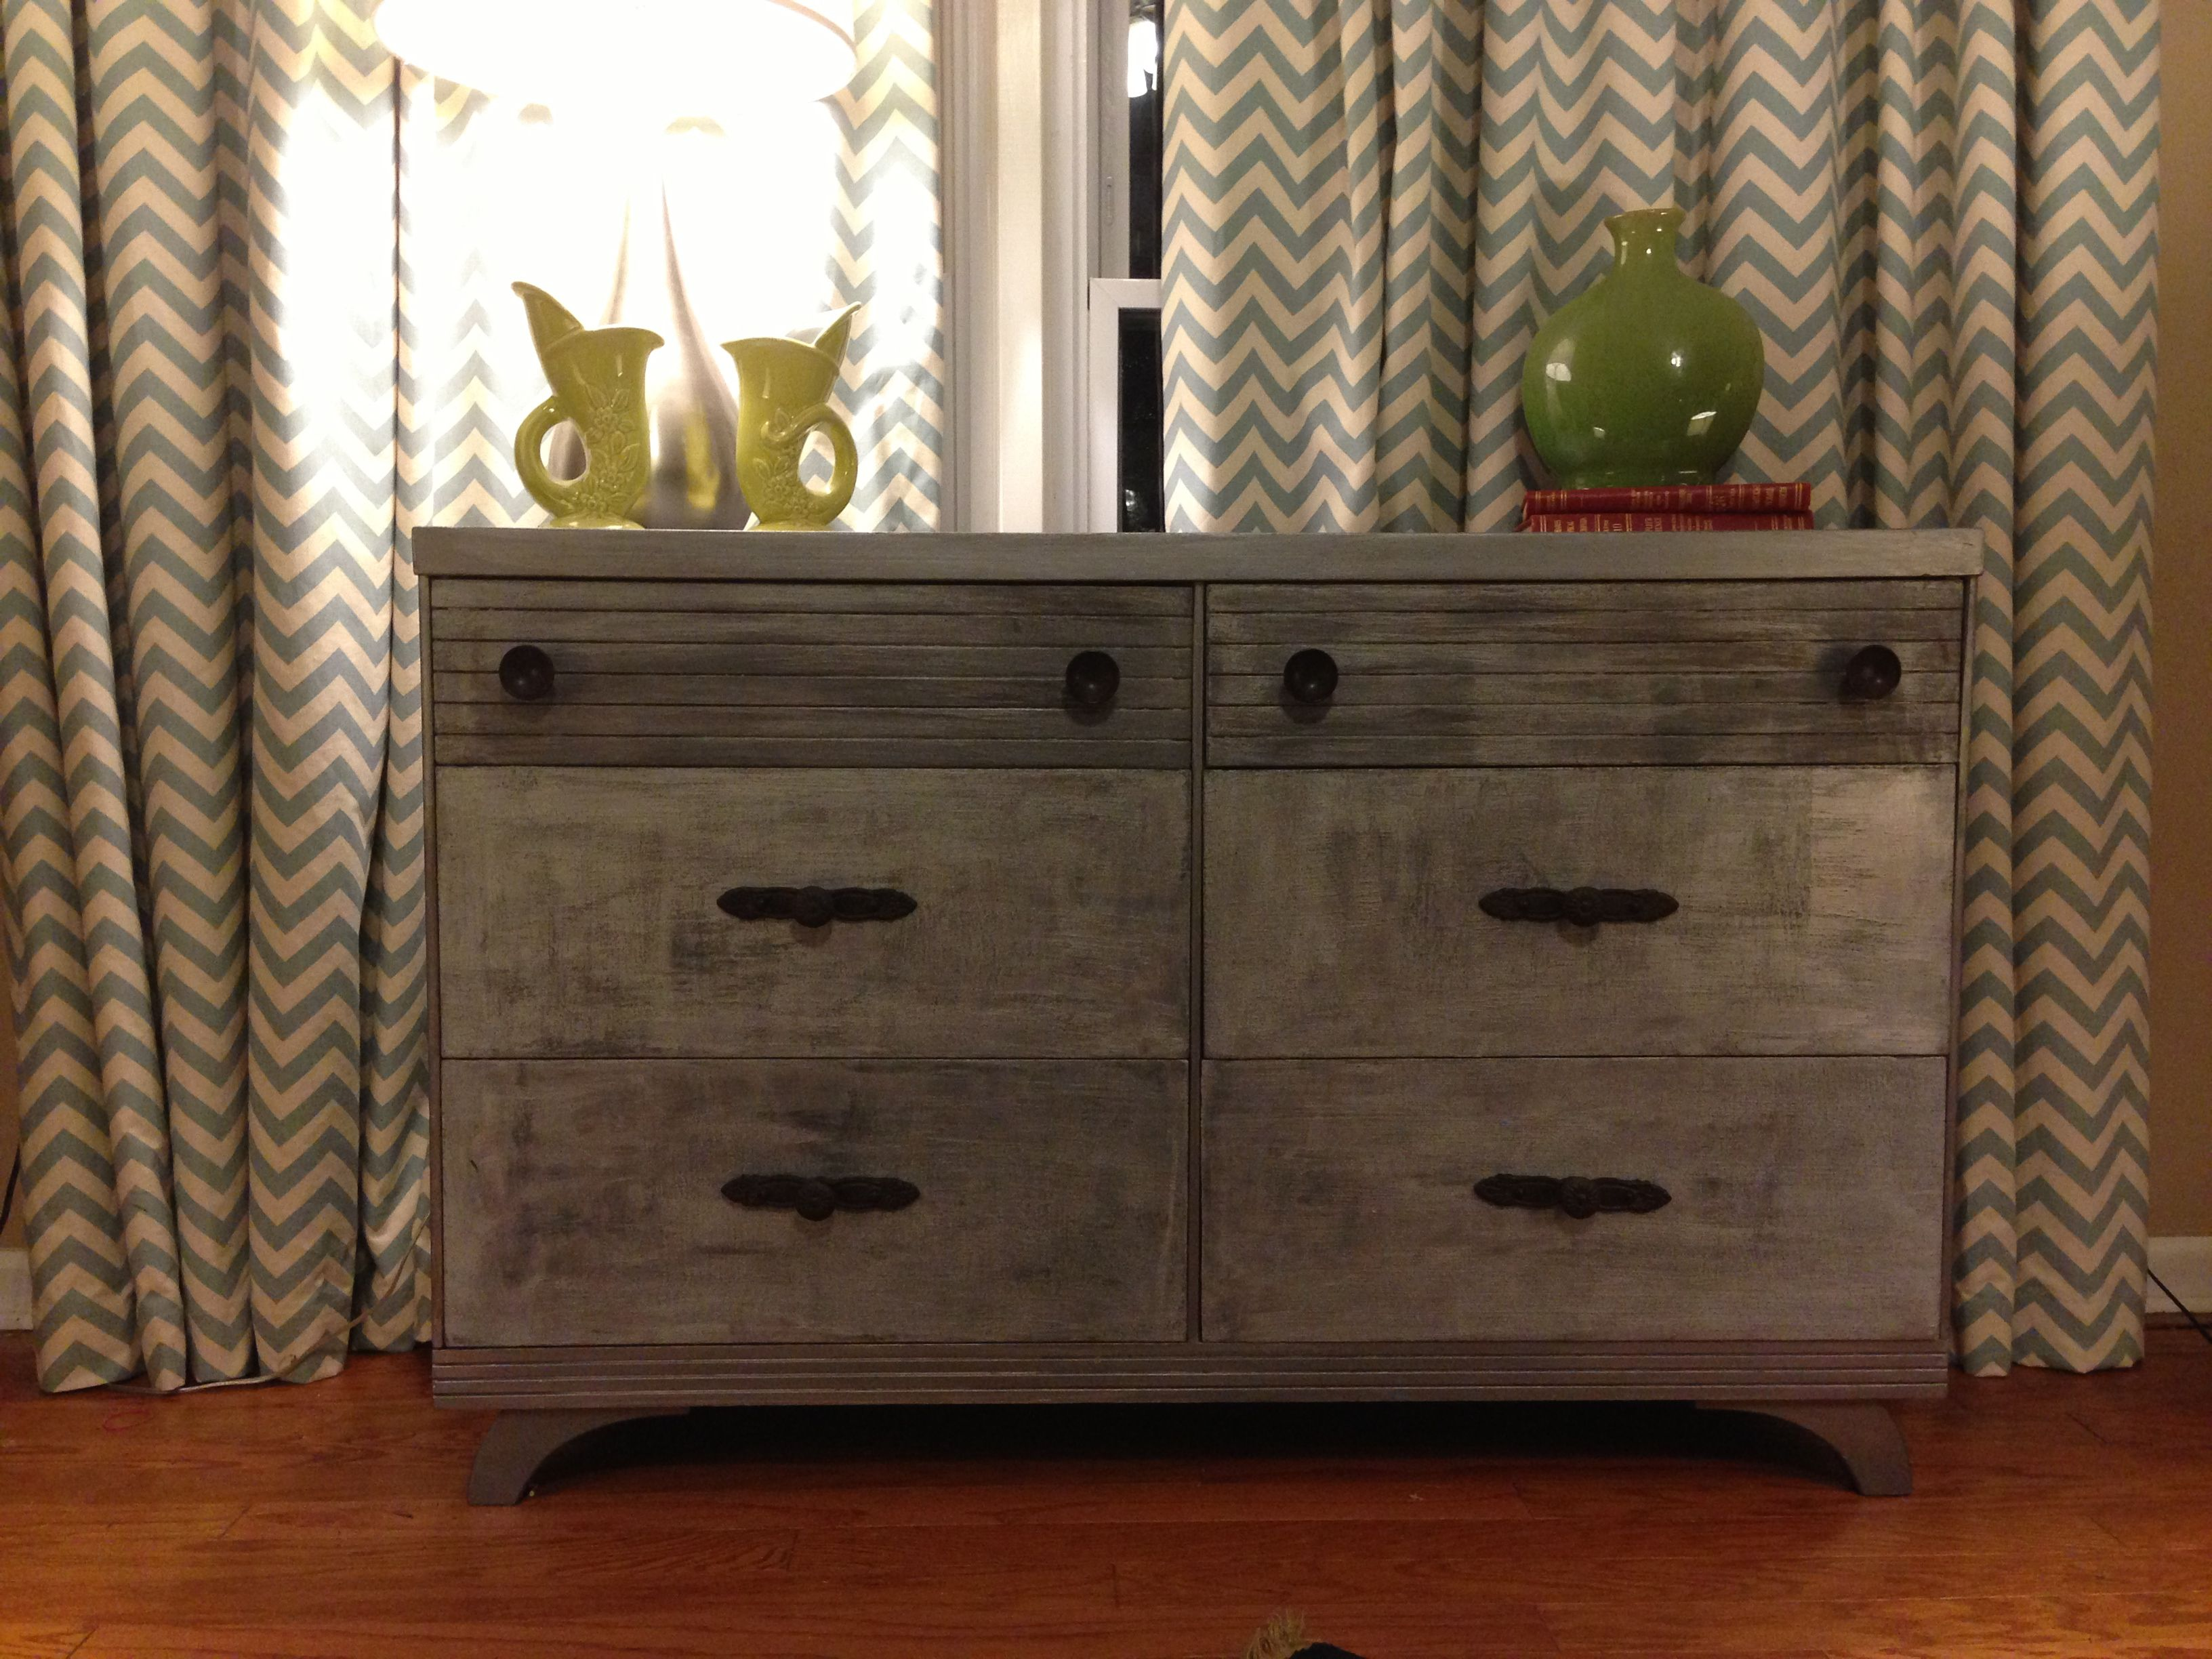 Martha Stewart textured metallic paint and glaze Dressers